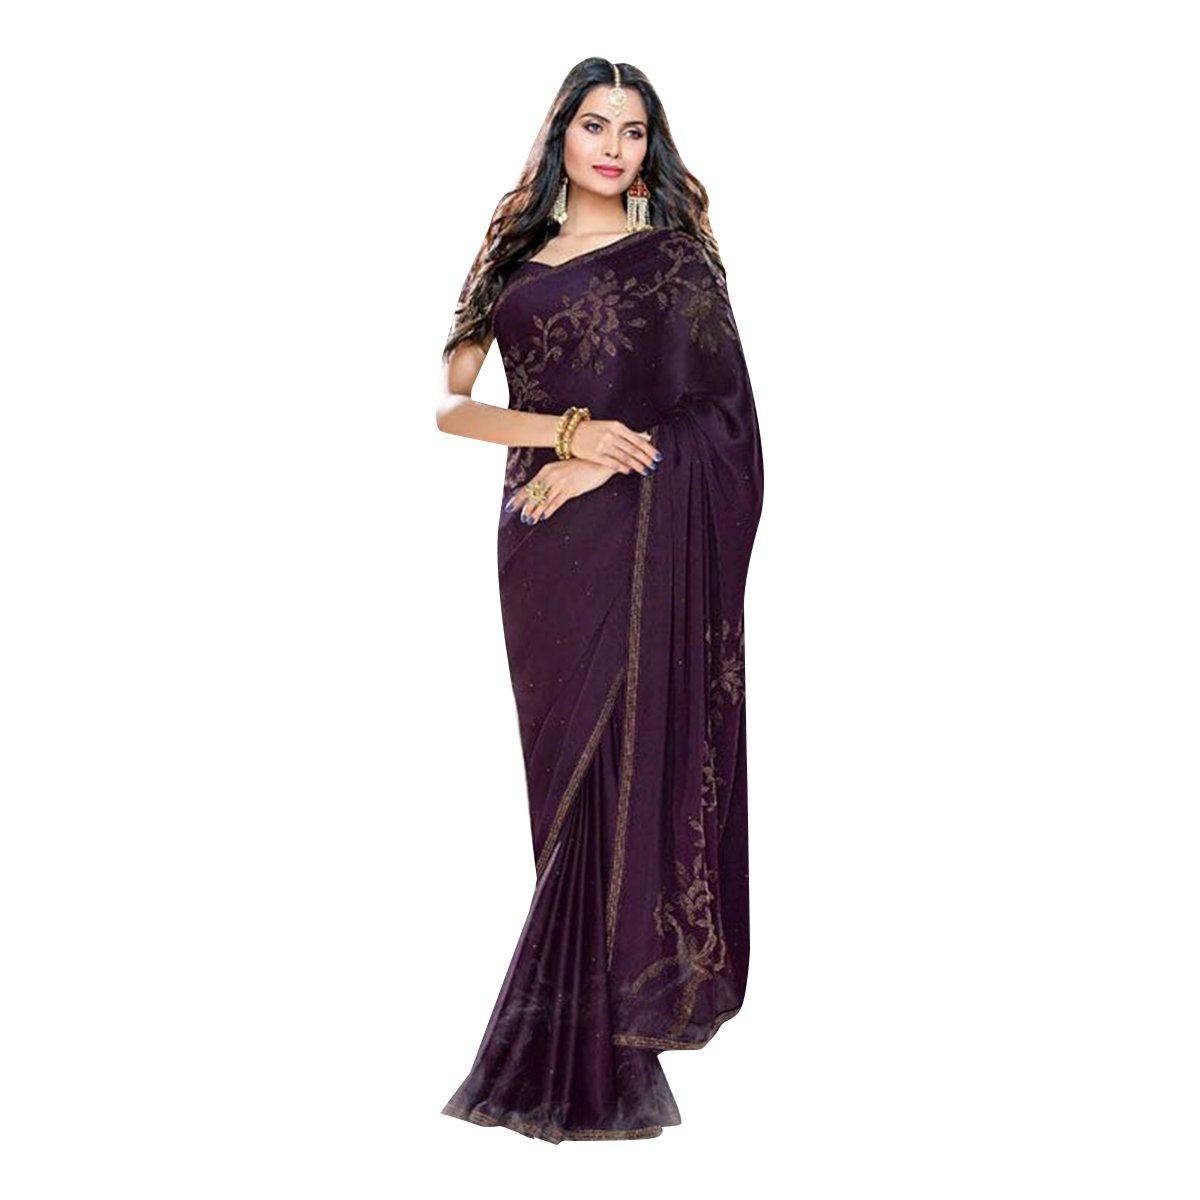 d4c7cd8954d07 Amazon.com  New Hot Sexy Bollywood Satin Printed Seroski Swarovski Work  Saree Sari Blouse Women Wedding Ceremony Party Wear Satin BALAJI Emporium   Clothing